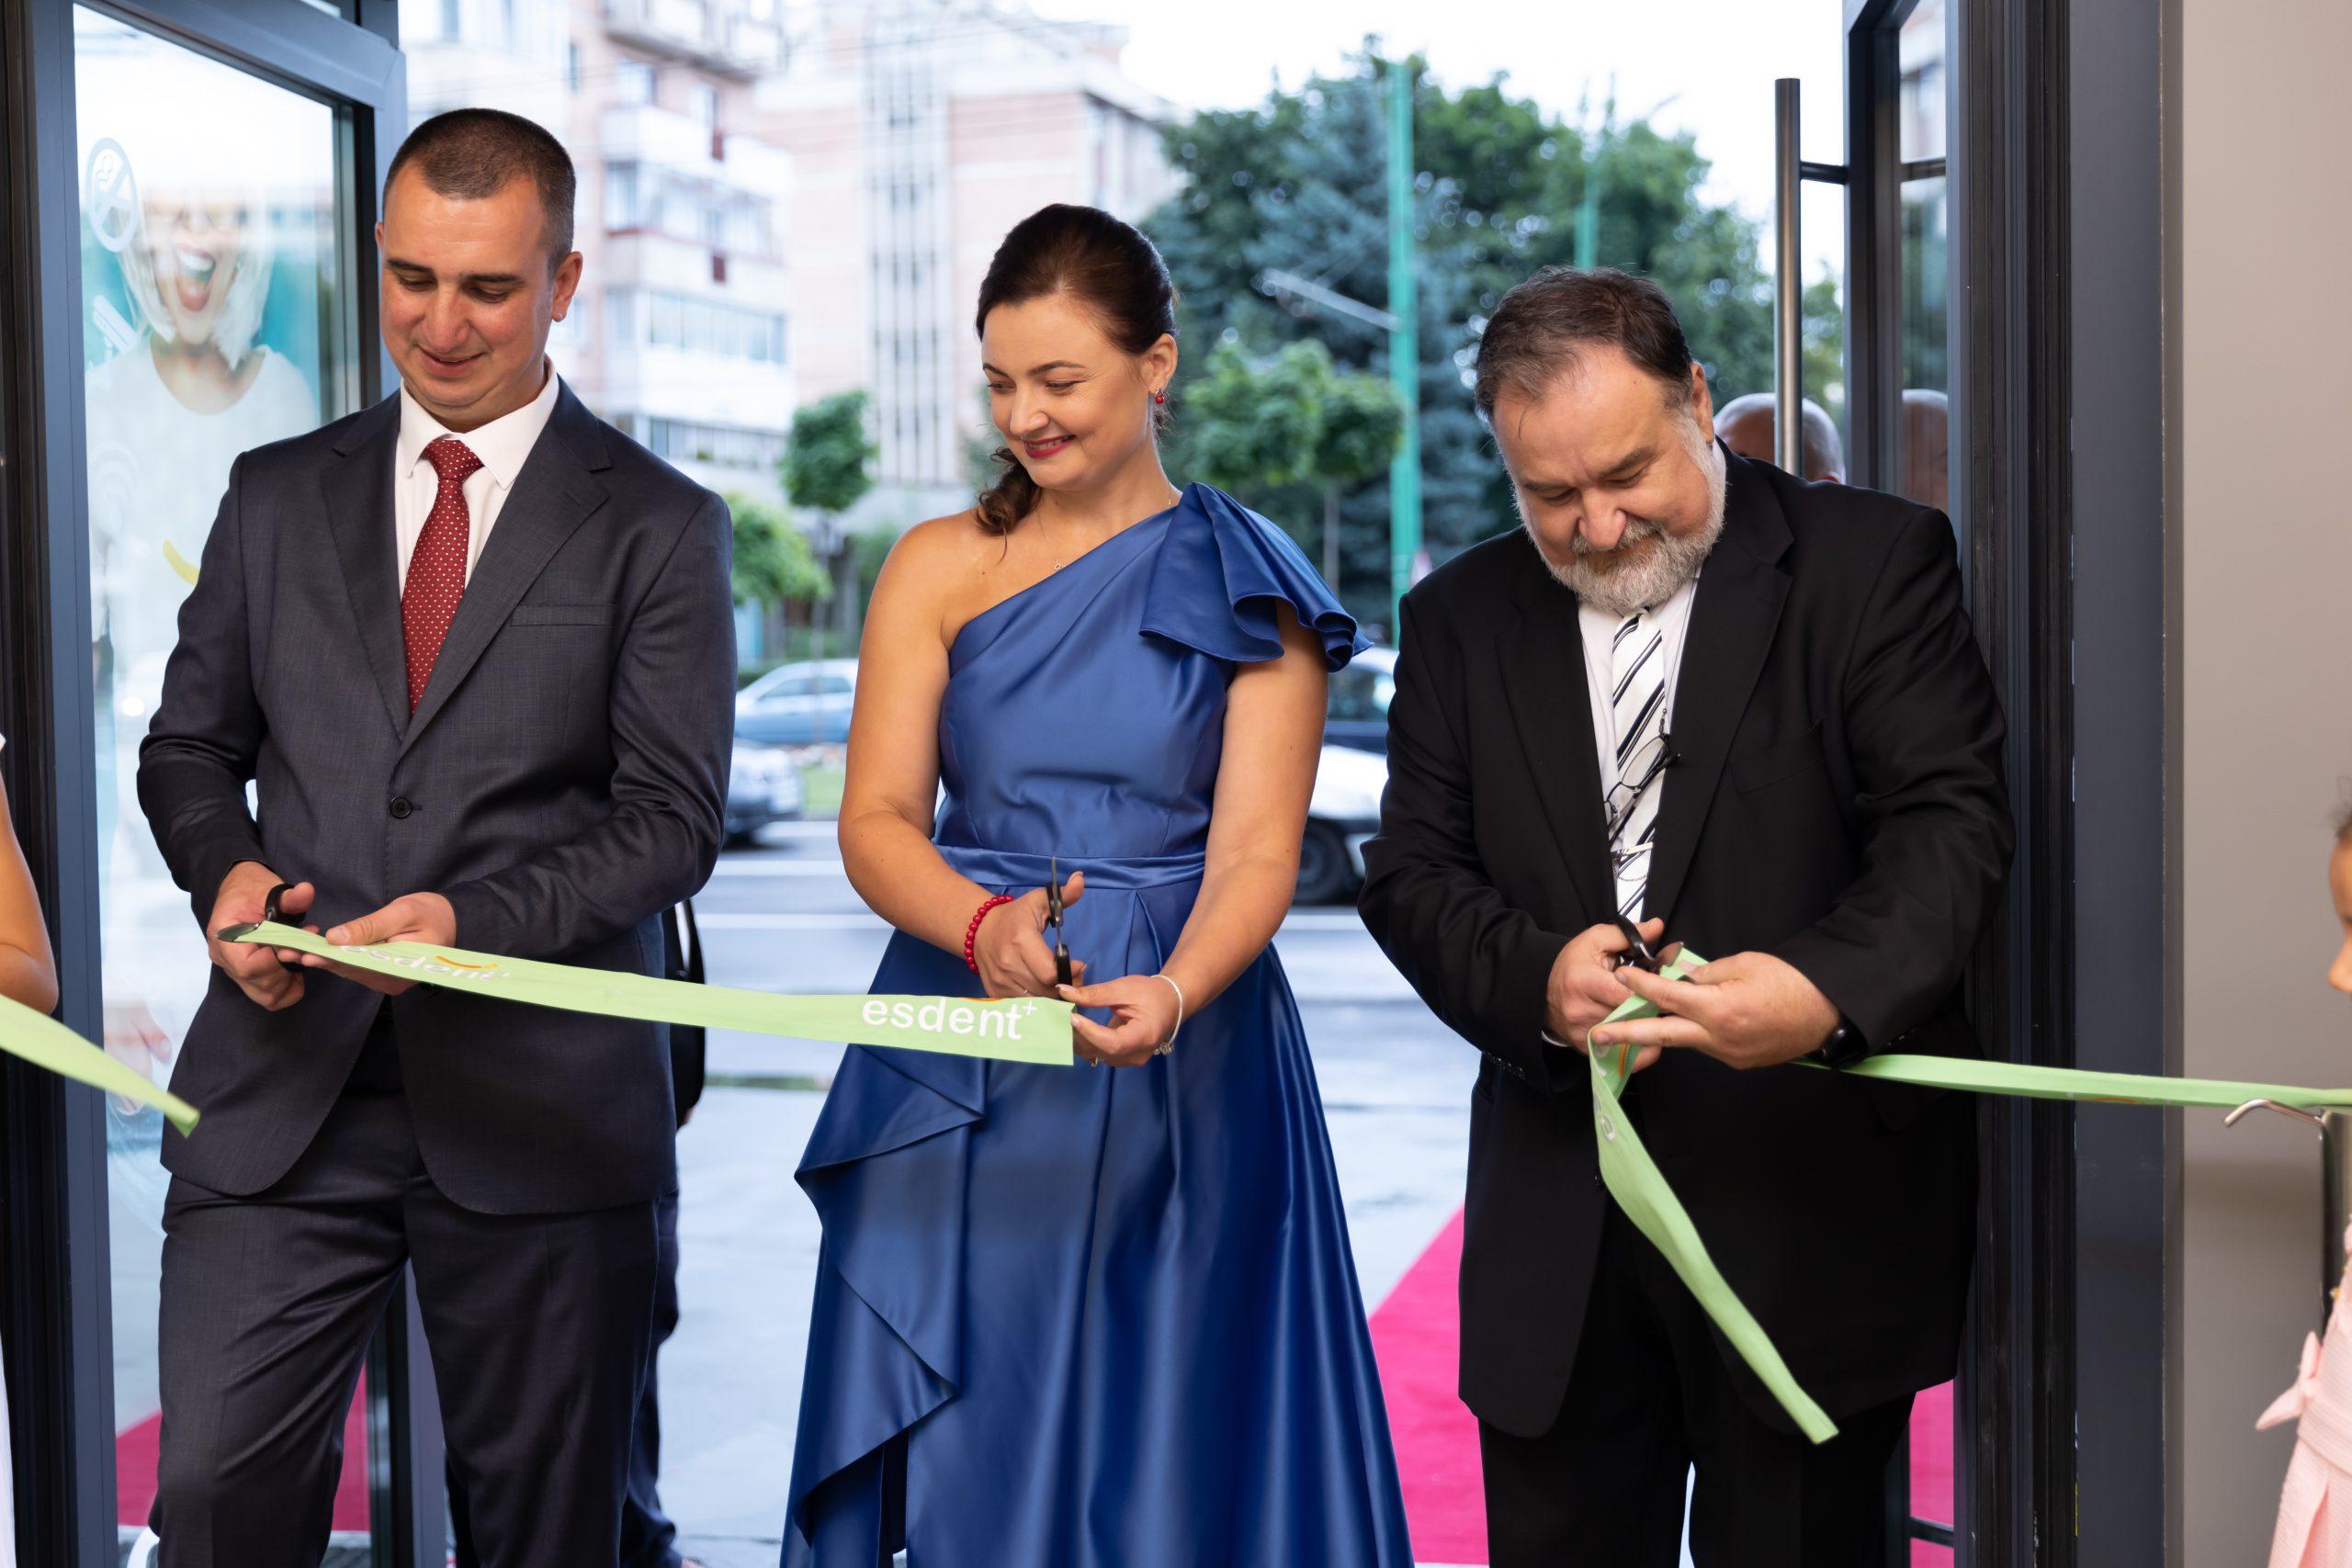 EsDent Brasov inaugurare clinica multidisciplinara